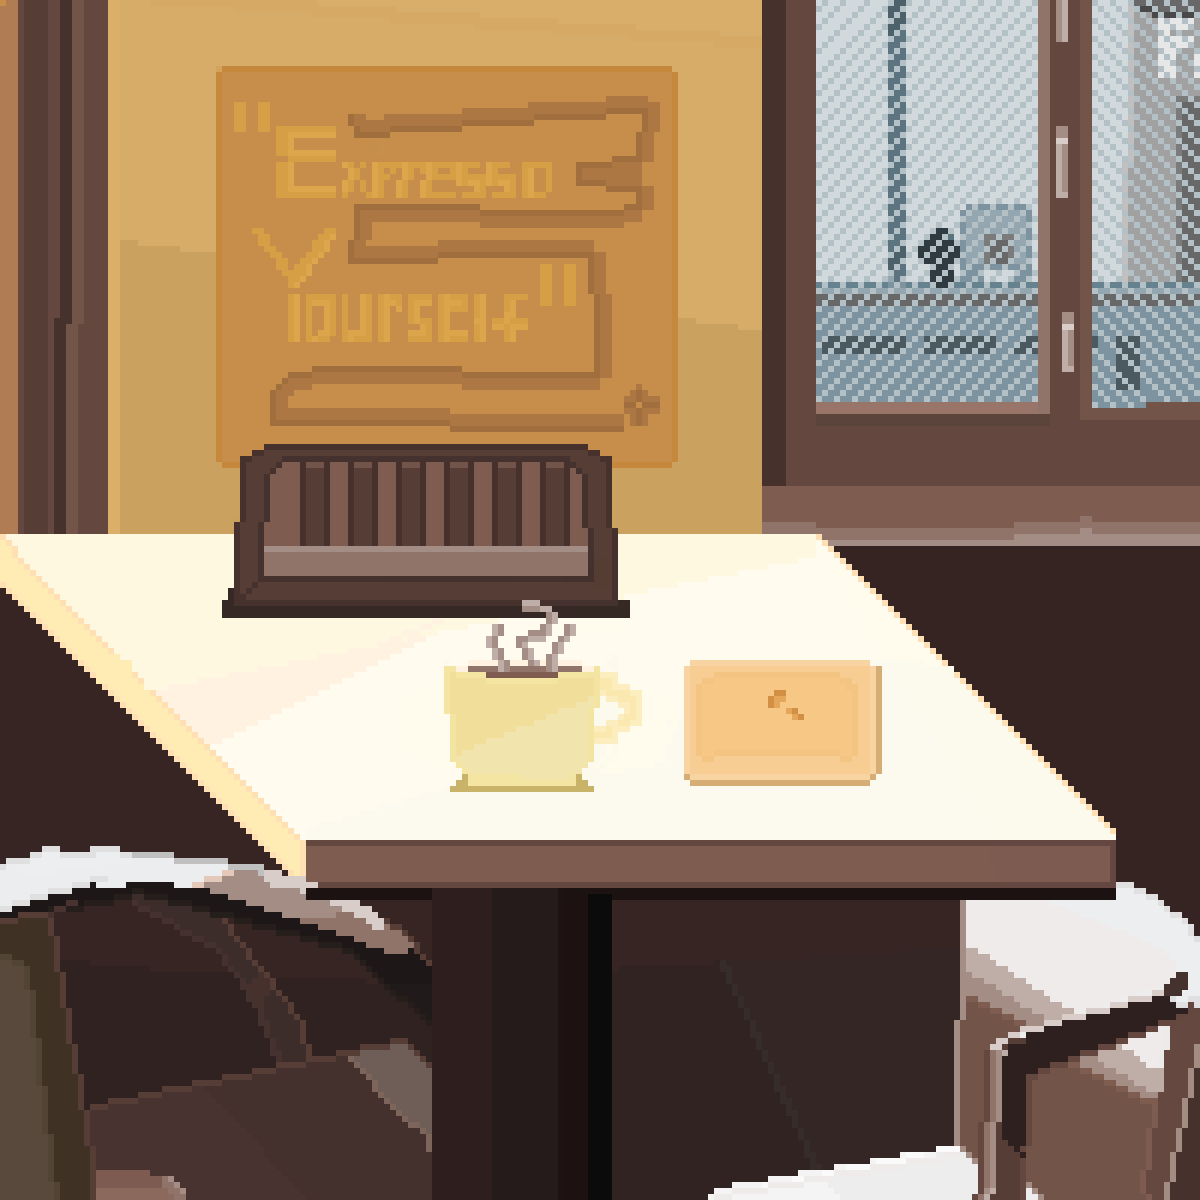 rainy day at the cafe